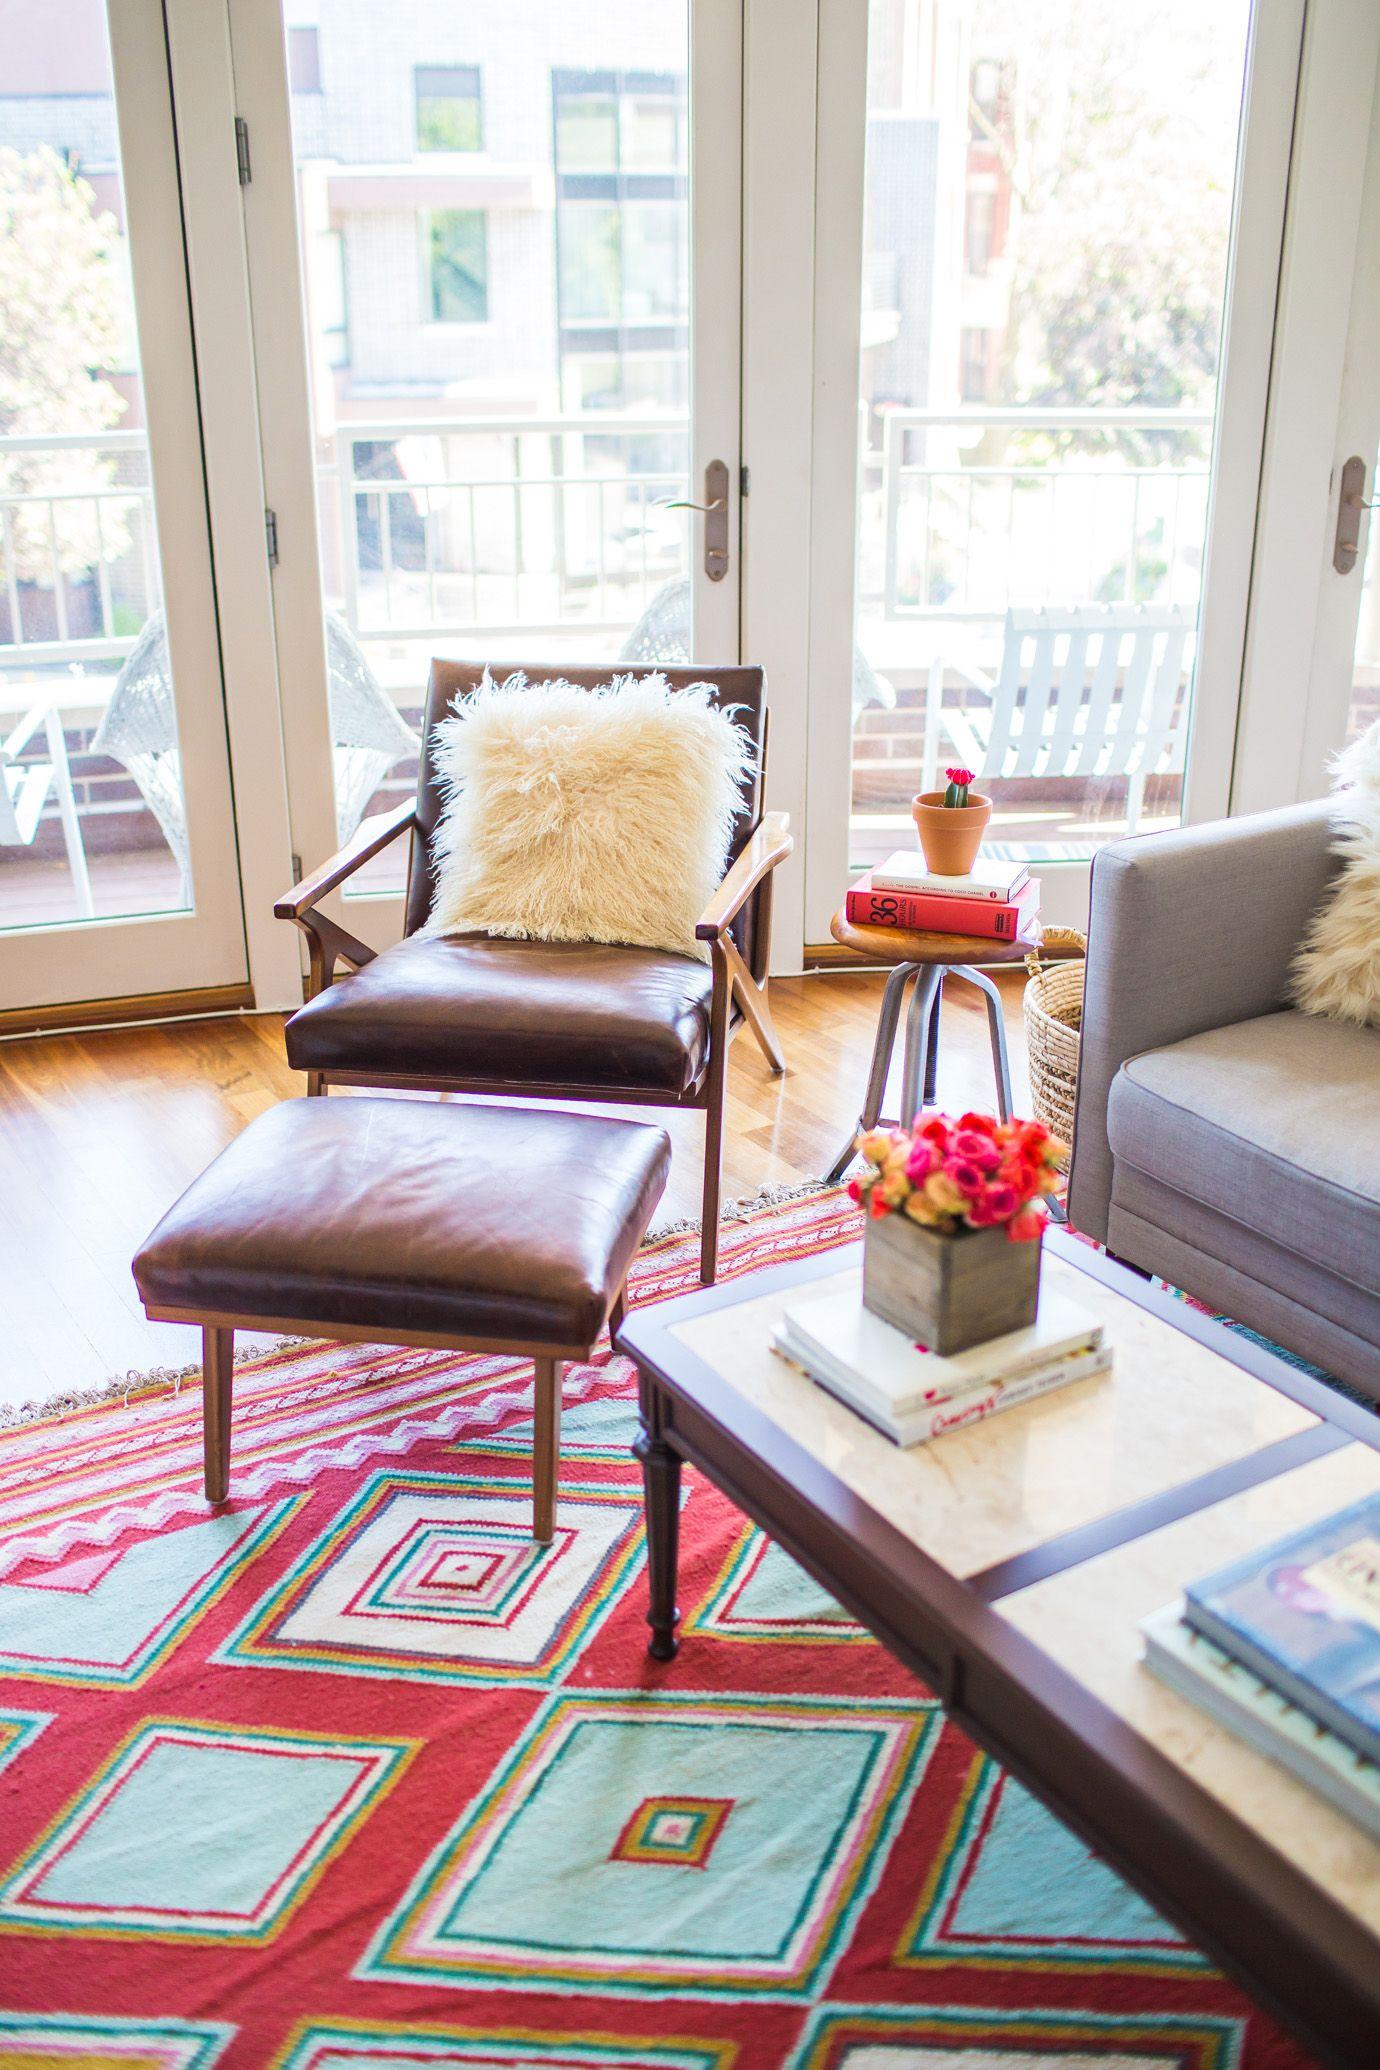 living room rug swap 15 colorful rugs home design rugs in rh pinterest com